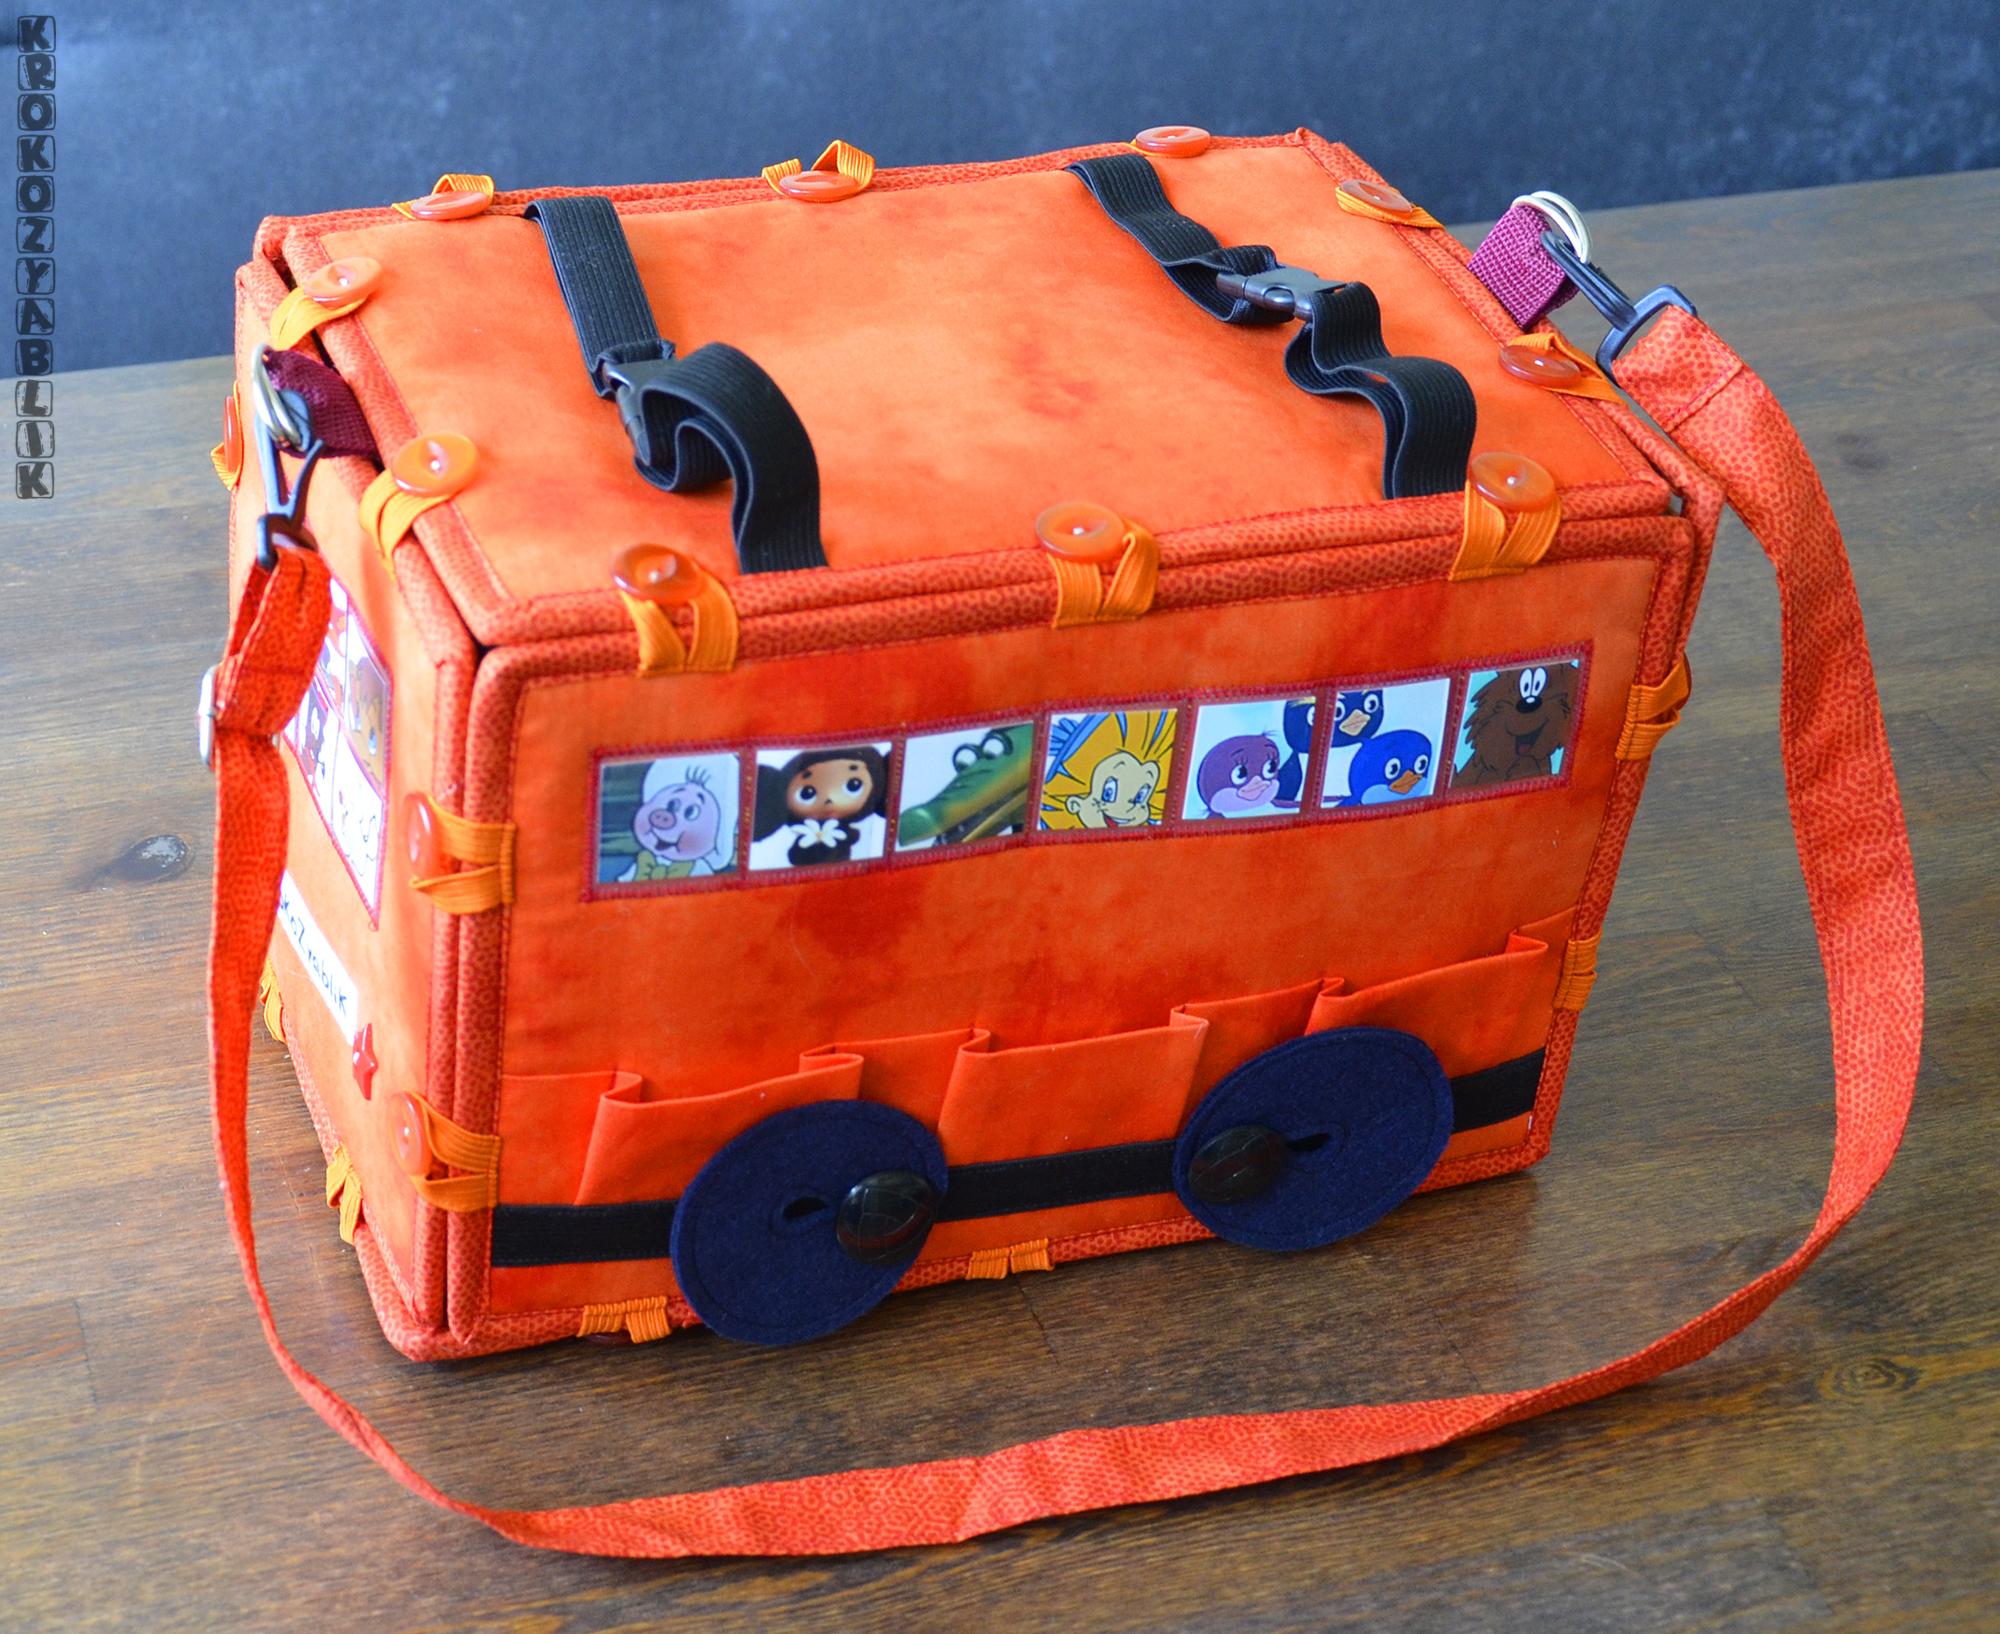 оранжевый автобус сумка конструктор рыбалка 5.JPG